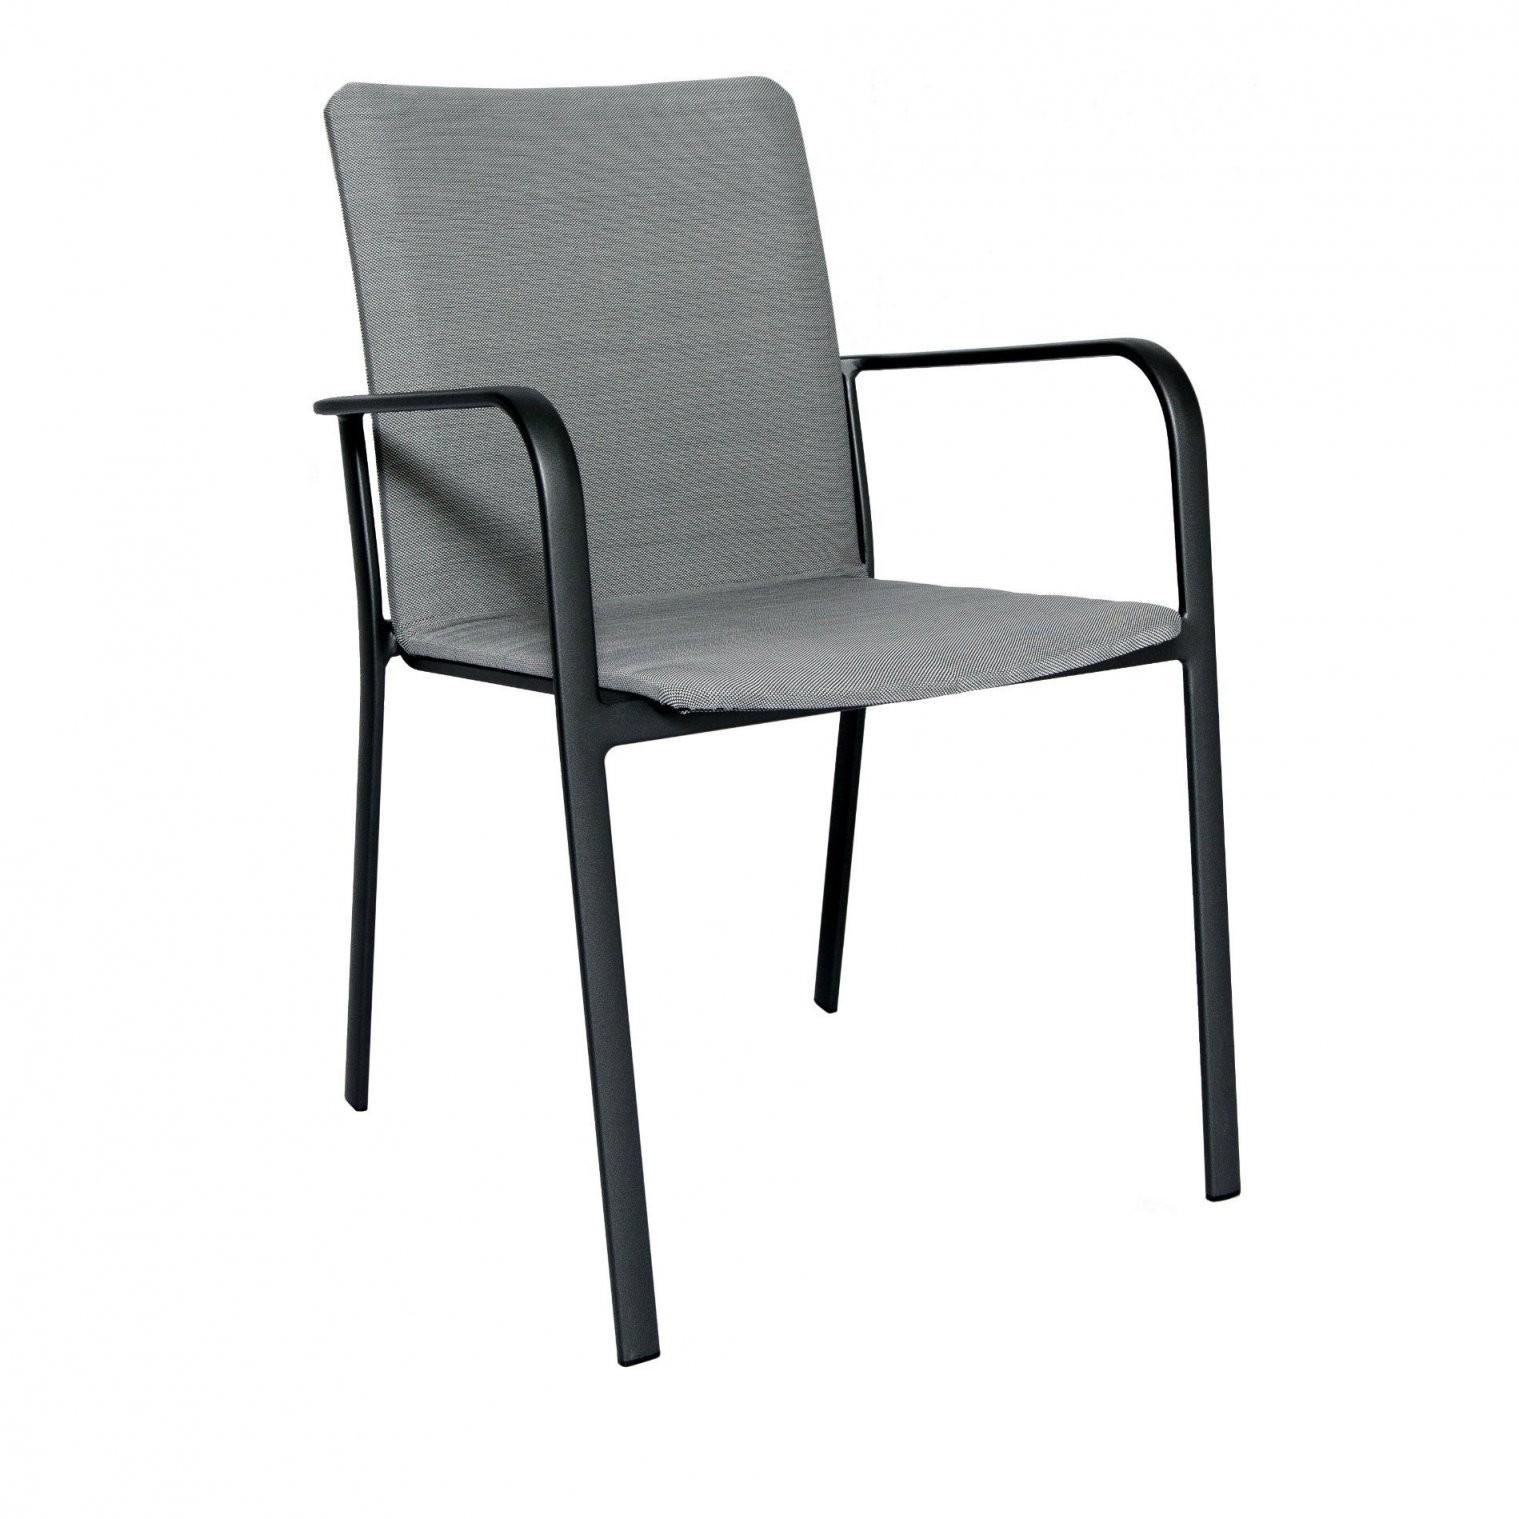 Gartenstühle Alu Hochlehner Stapelbar Ideen von Gartenstühle Alu Hochlehner Stapelbar Bild